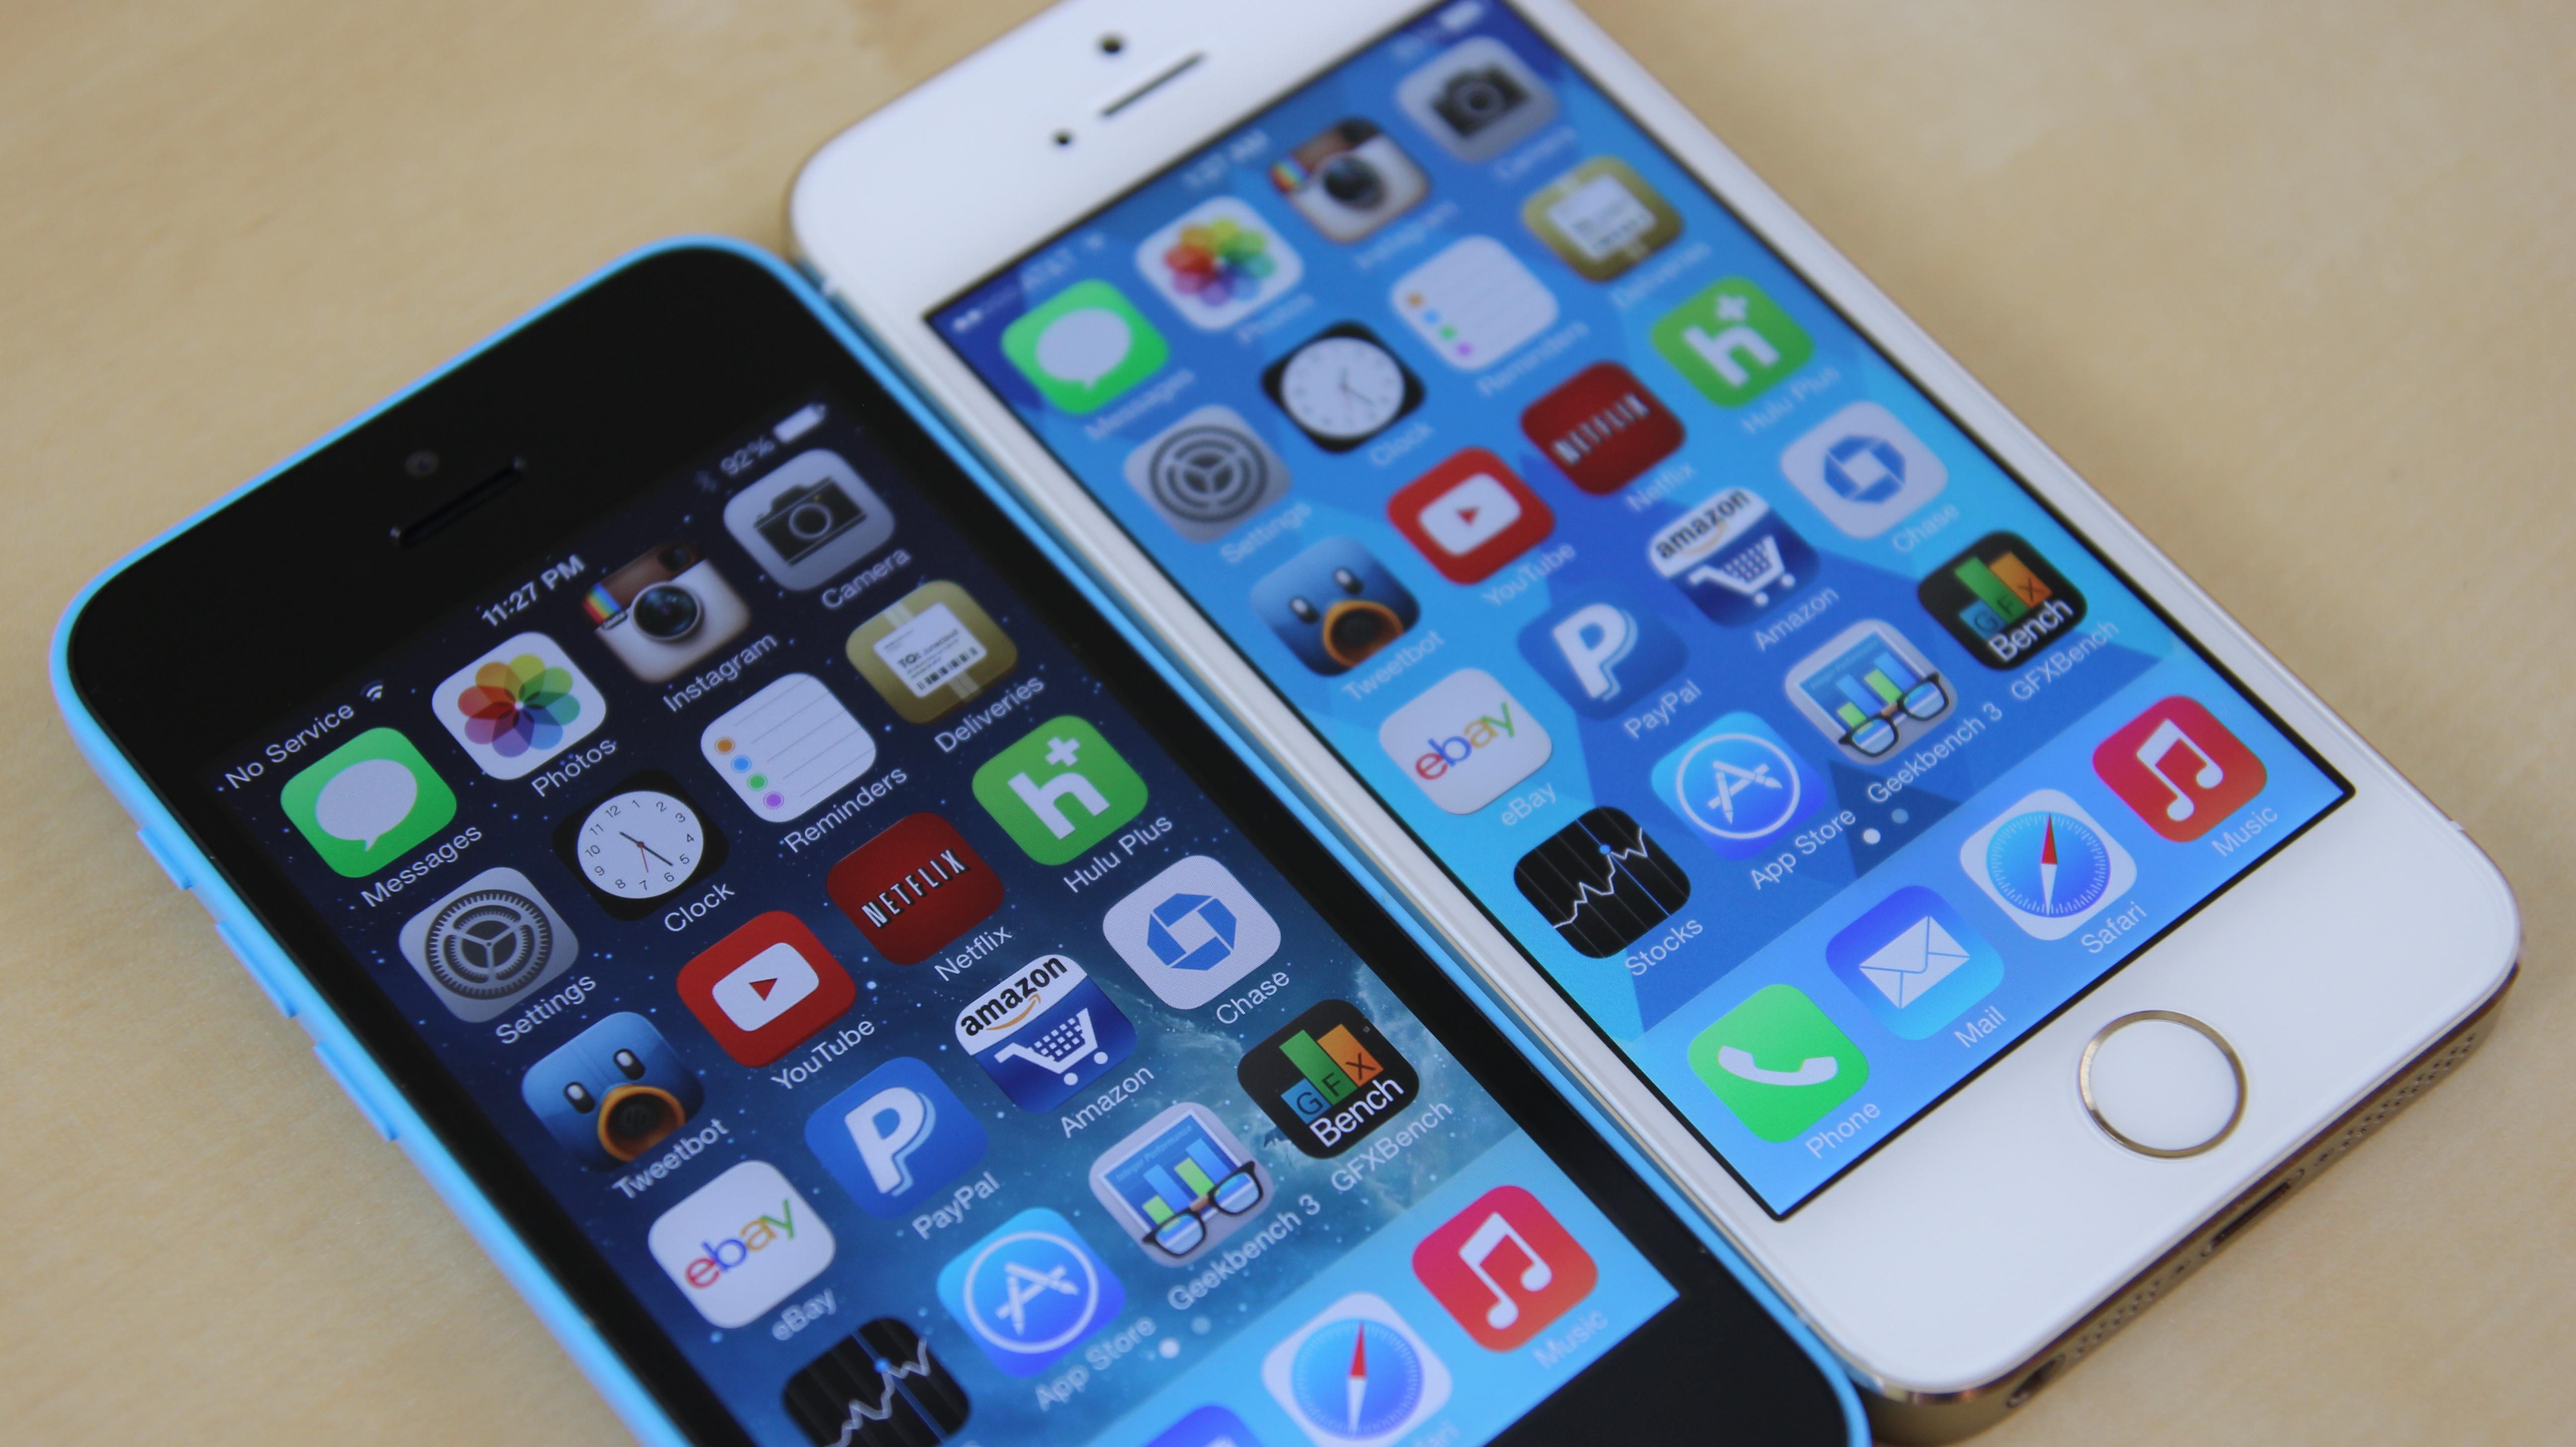 apple iphone 5s vs 5c comparison w features huffpost. Black Bedroom Furniture Sets. Home Design Ideas